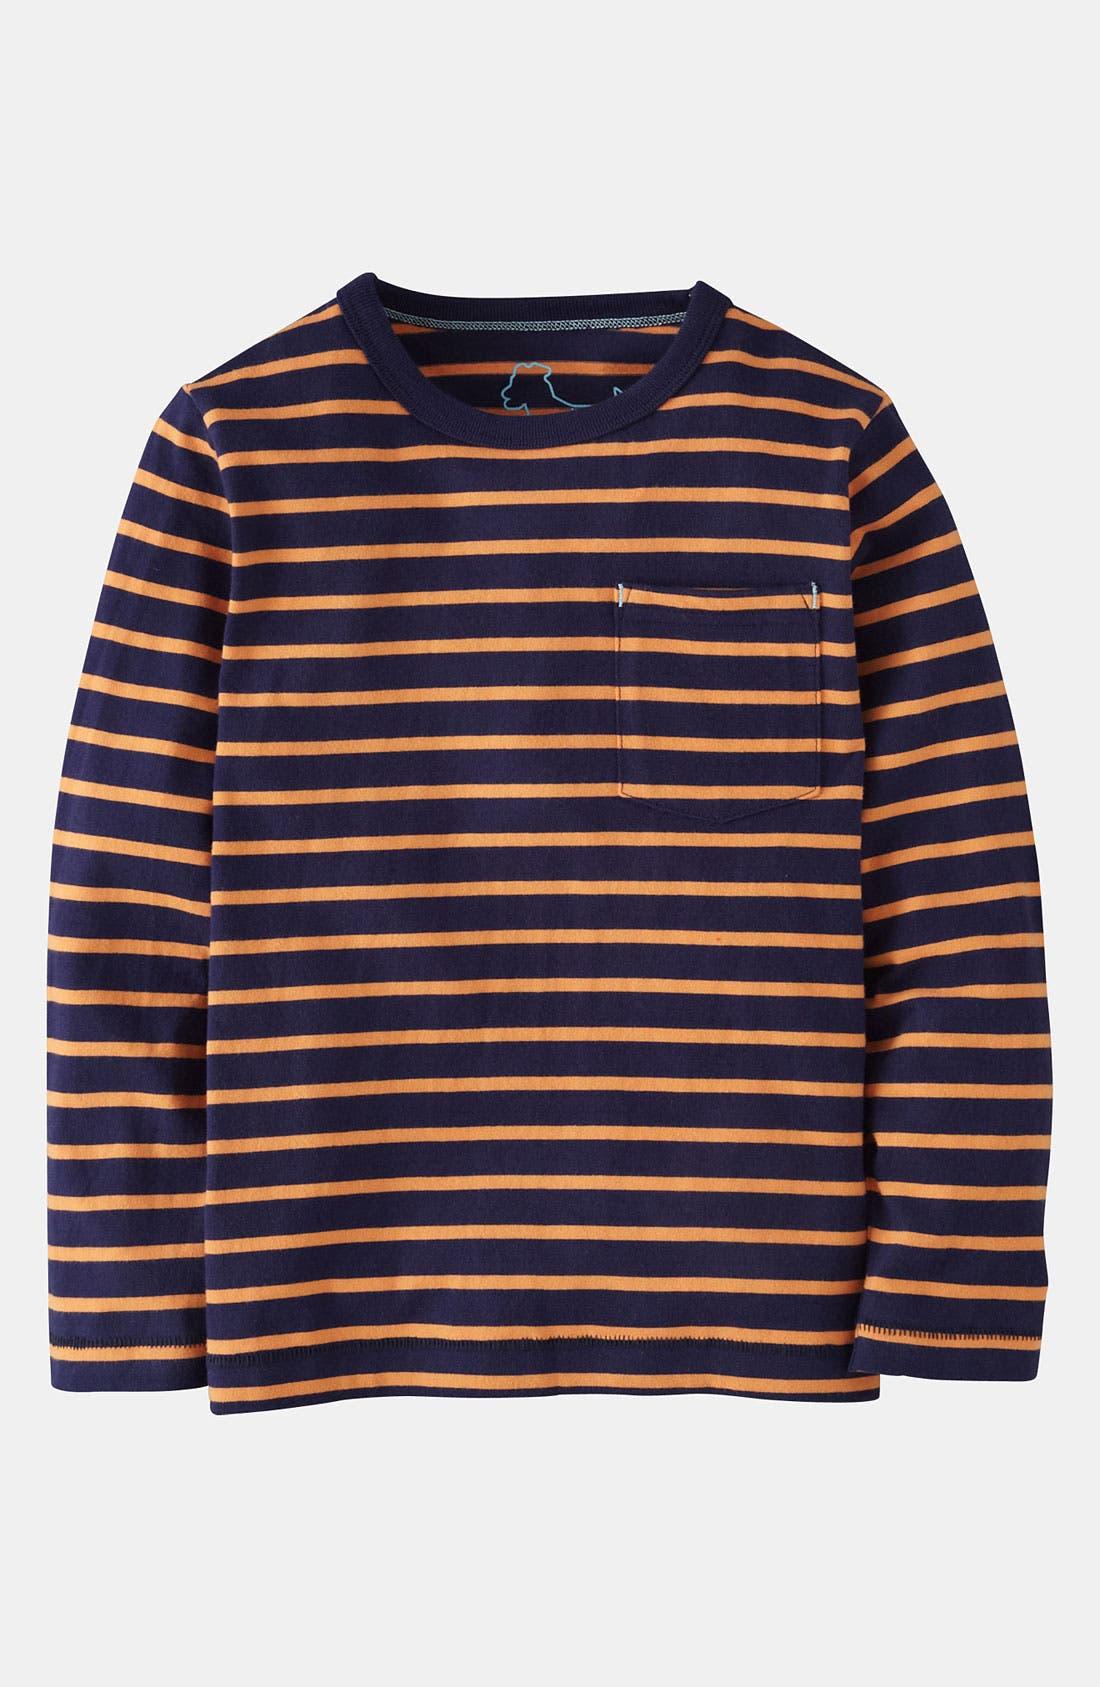 Main Image - Mini Boden Stripe T-Shirt (Little Boys & Big Boys)